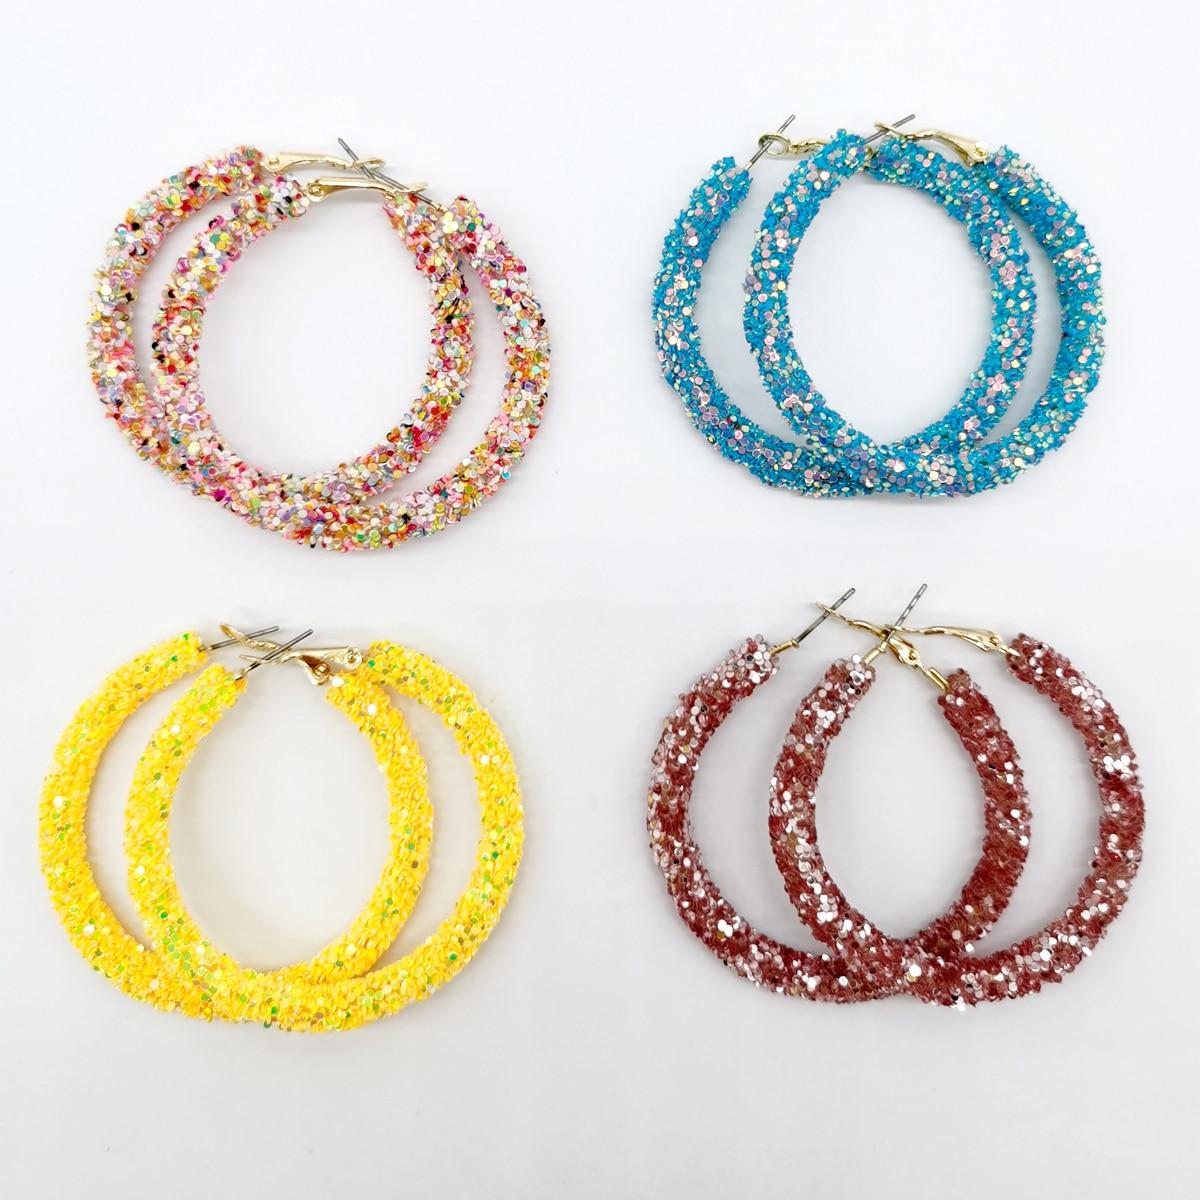 Fashion Crystal Hoop Earrings Glitter Sequins Jewelry Geometric Charm Design Round Bling Rhinestone Women Hoop Jewelry Earring